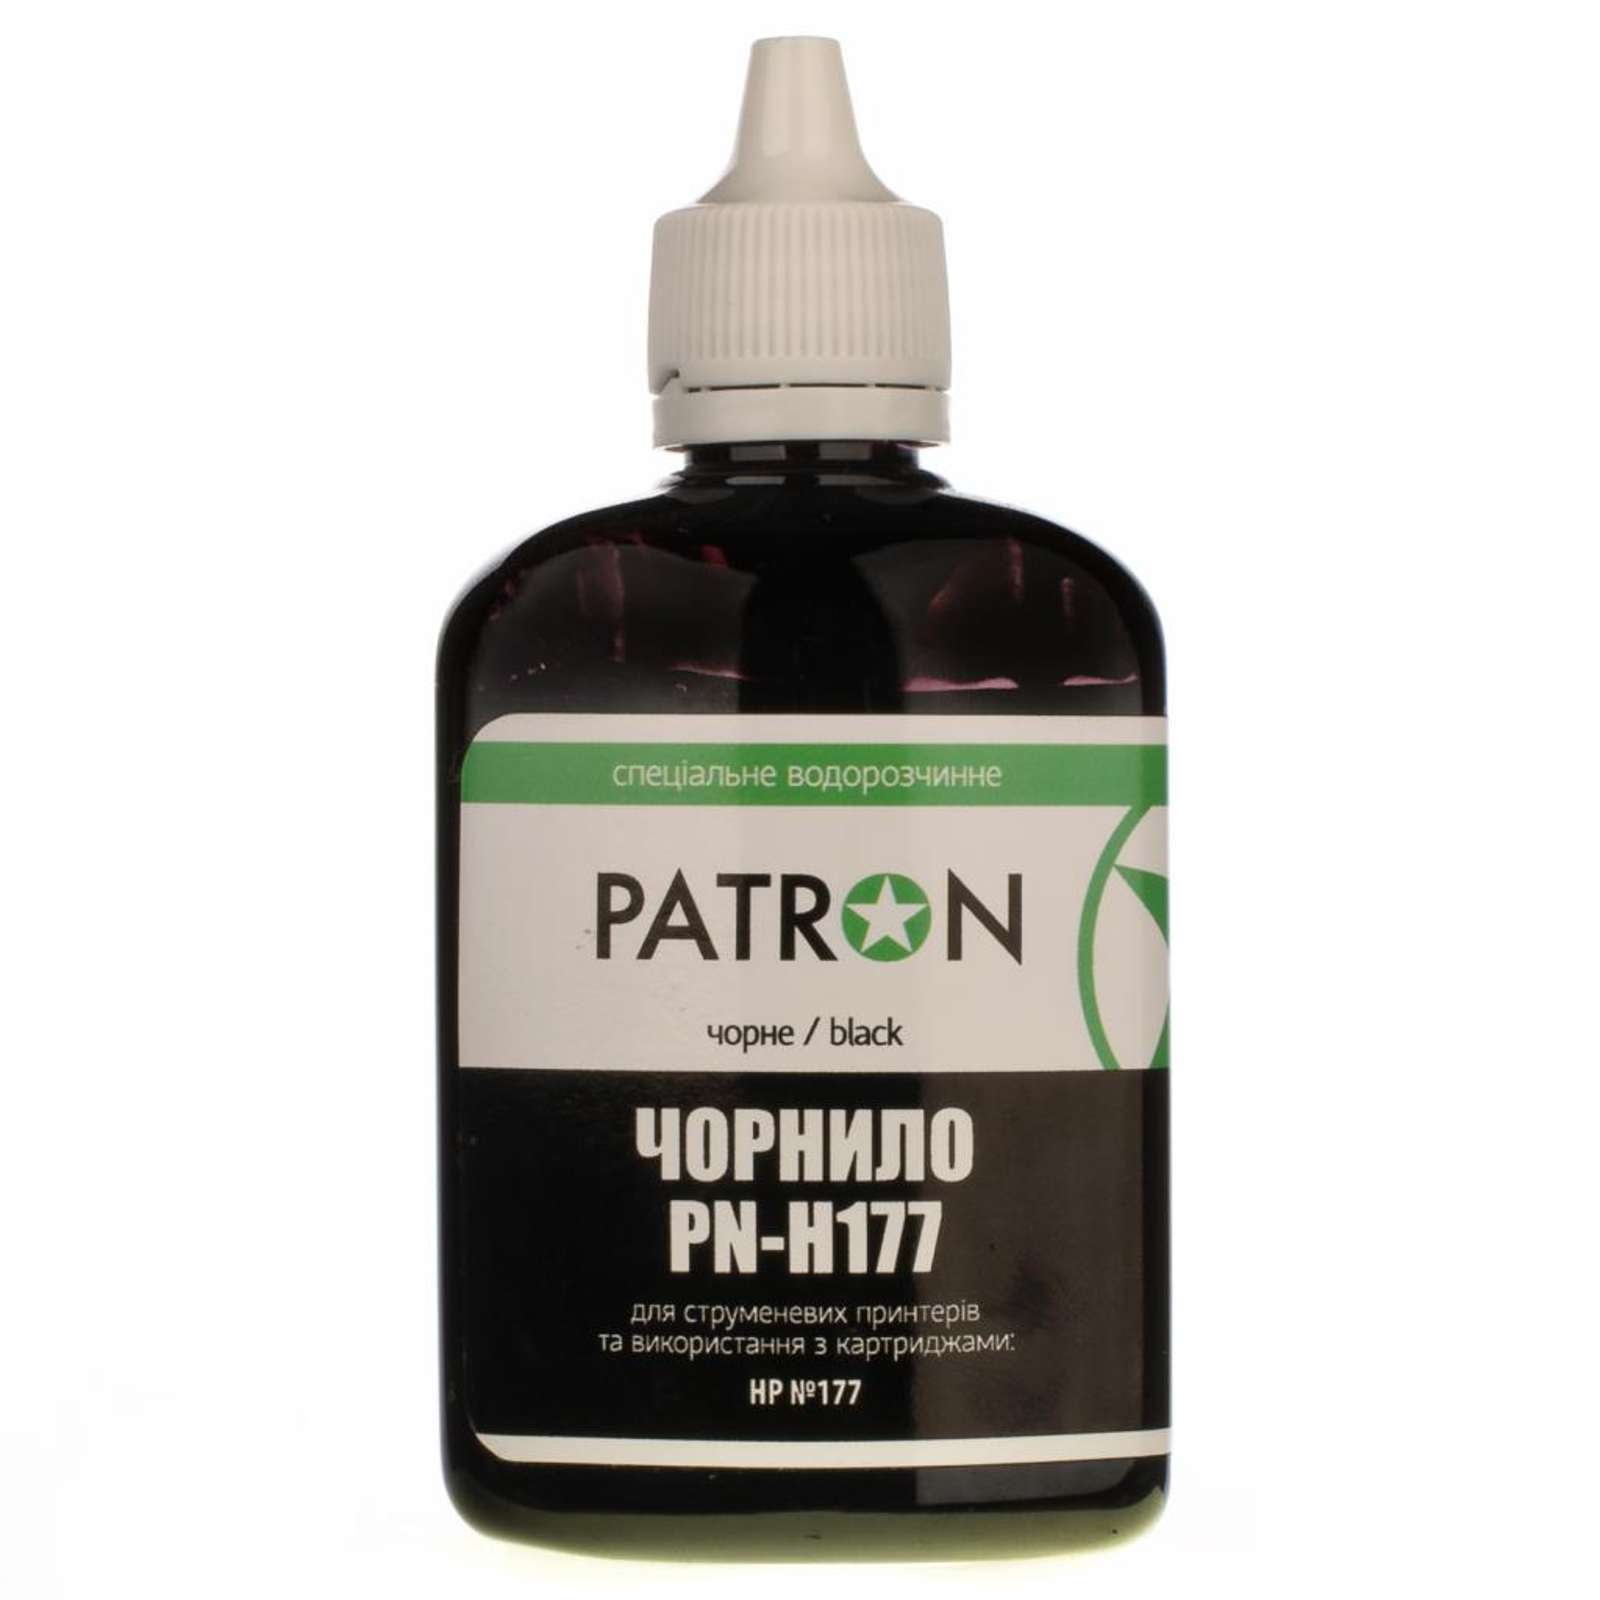 Чернила PATRON HP №177 90г BLACK для C8719/8721 (I-PN-H177-090-B)